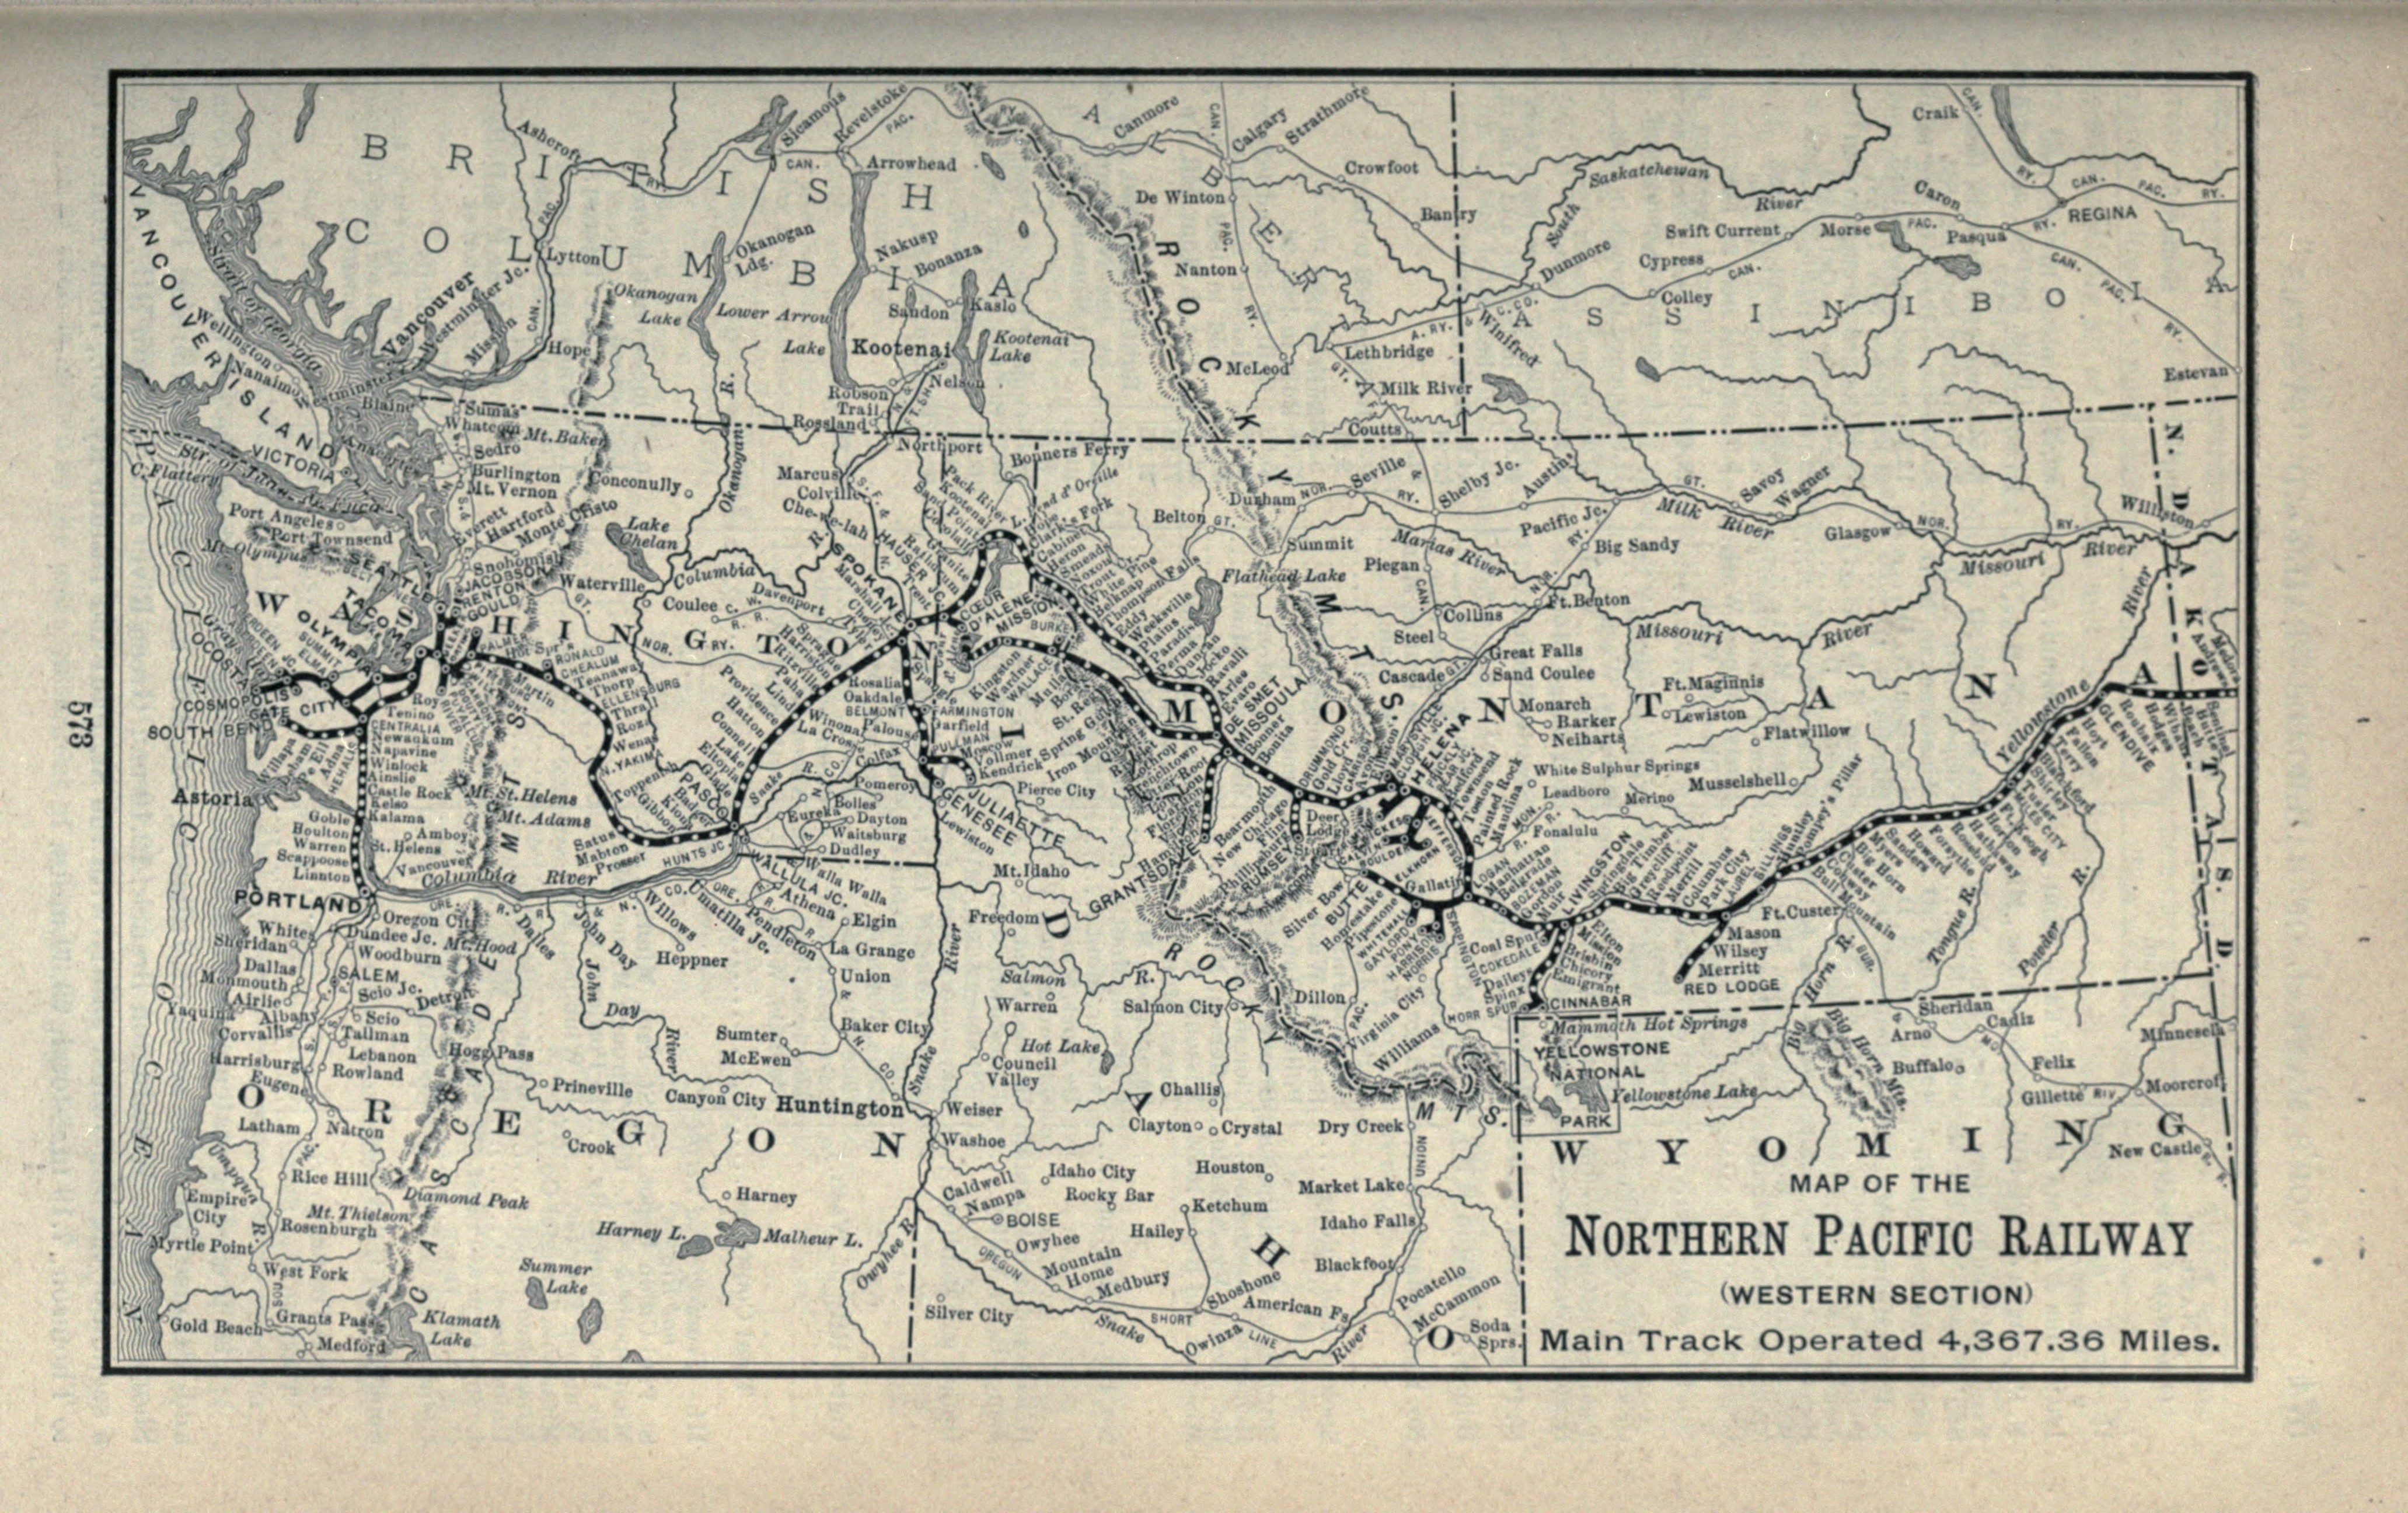 Description 1897 Poor's Northern Pacific Railway Western Section.jpg